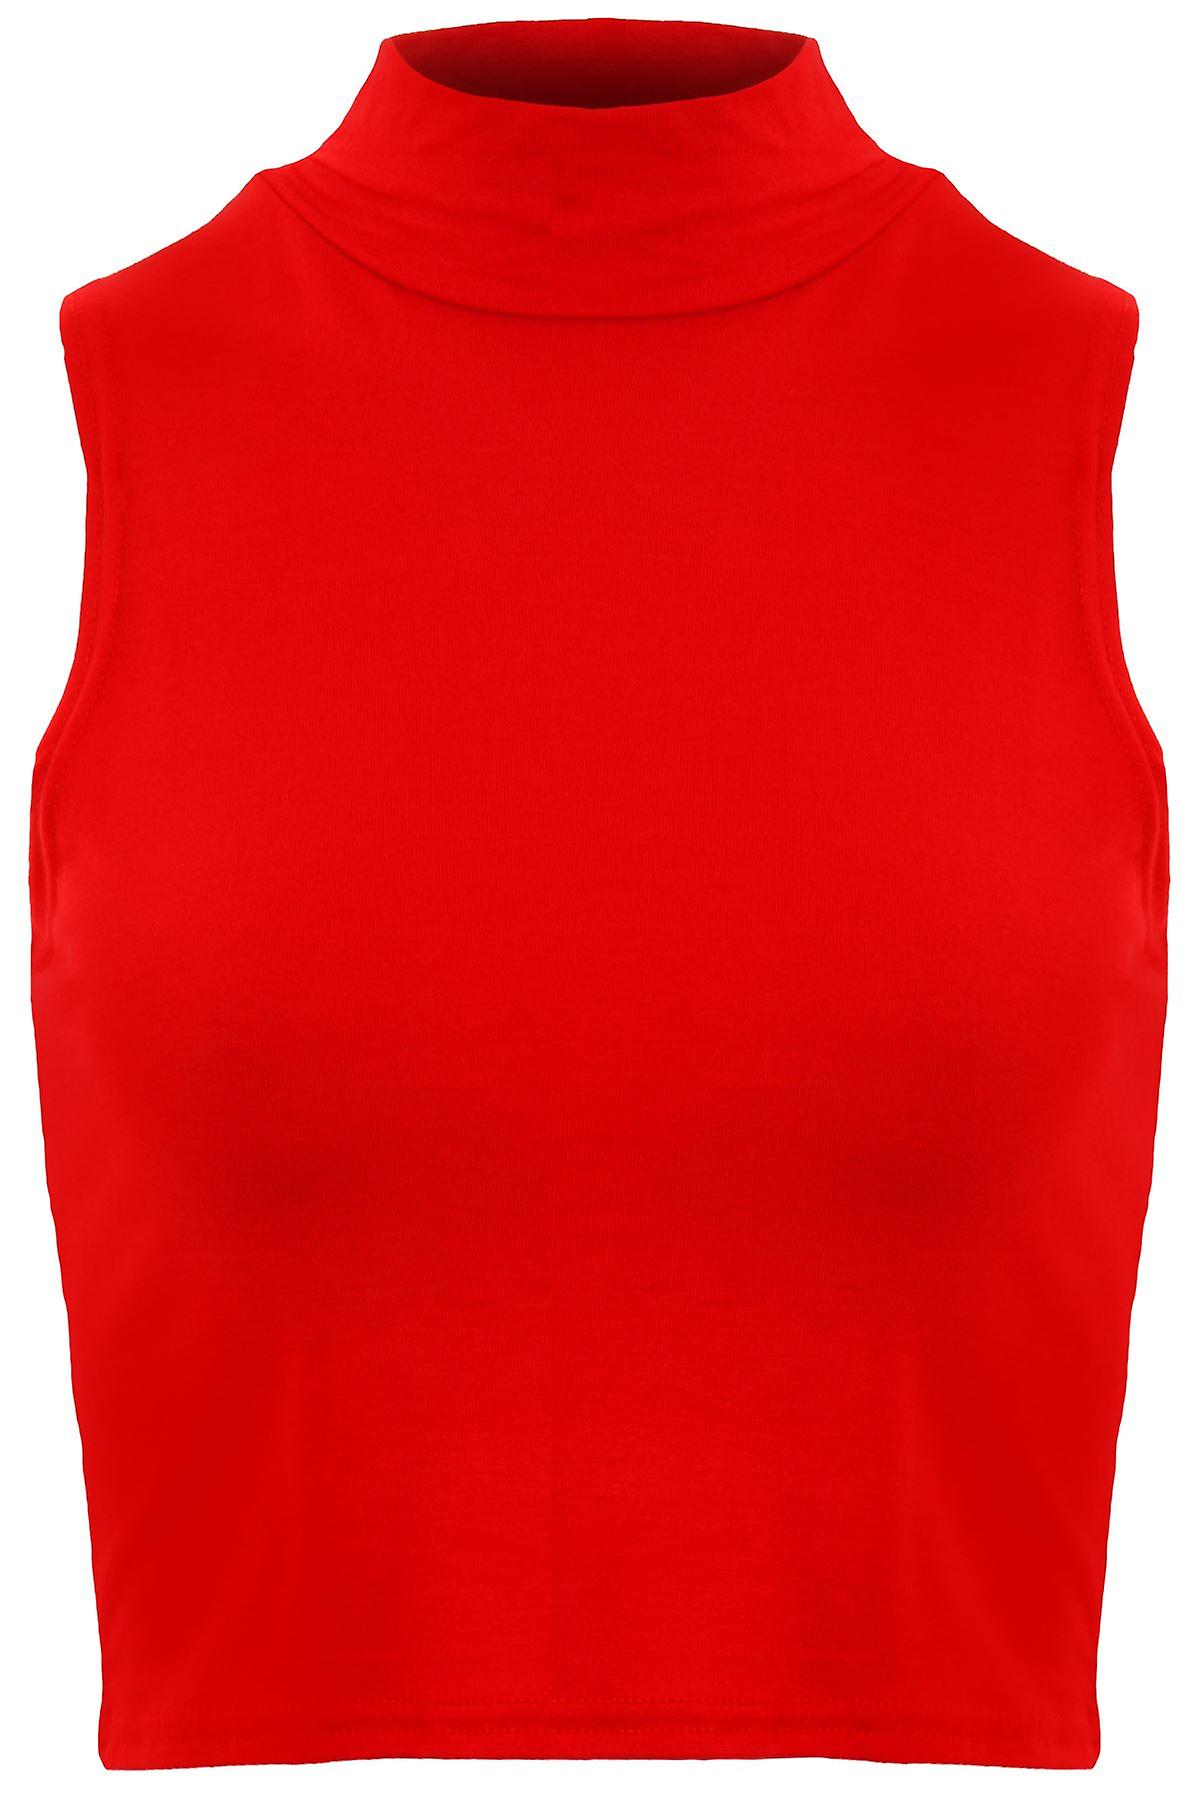 Ladies Sleeveless High Polo Turtle Neck Plain Stretch Vest Crop Top